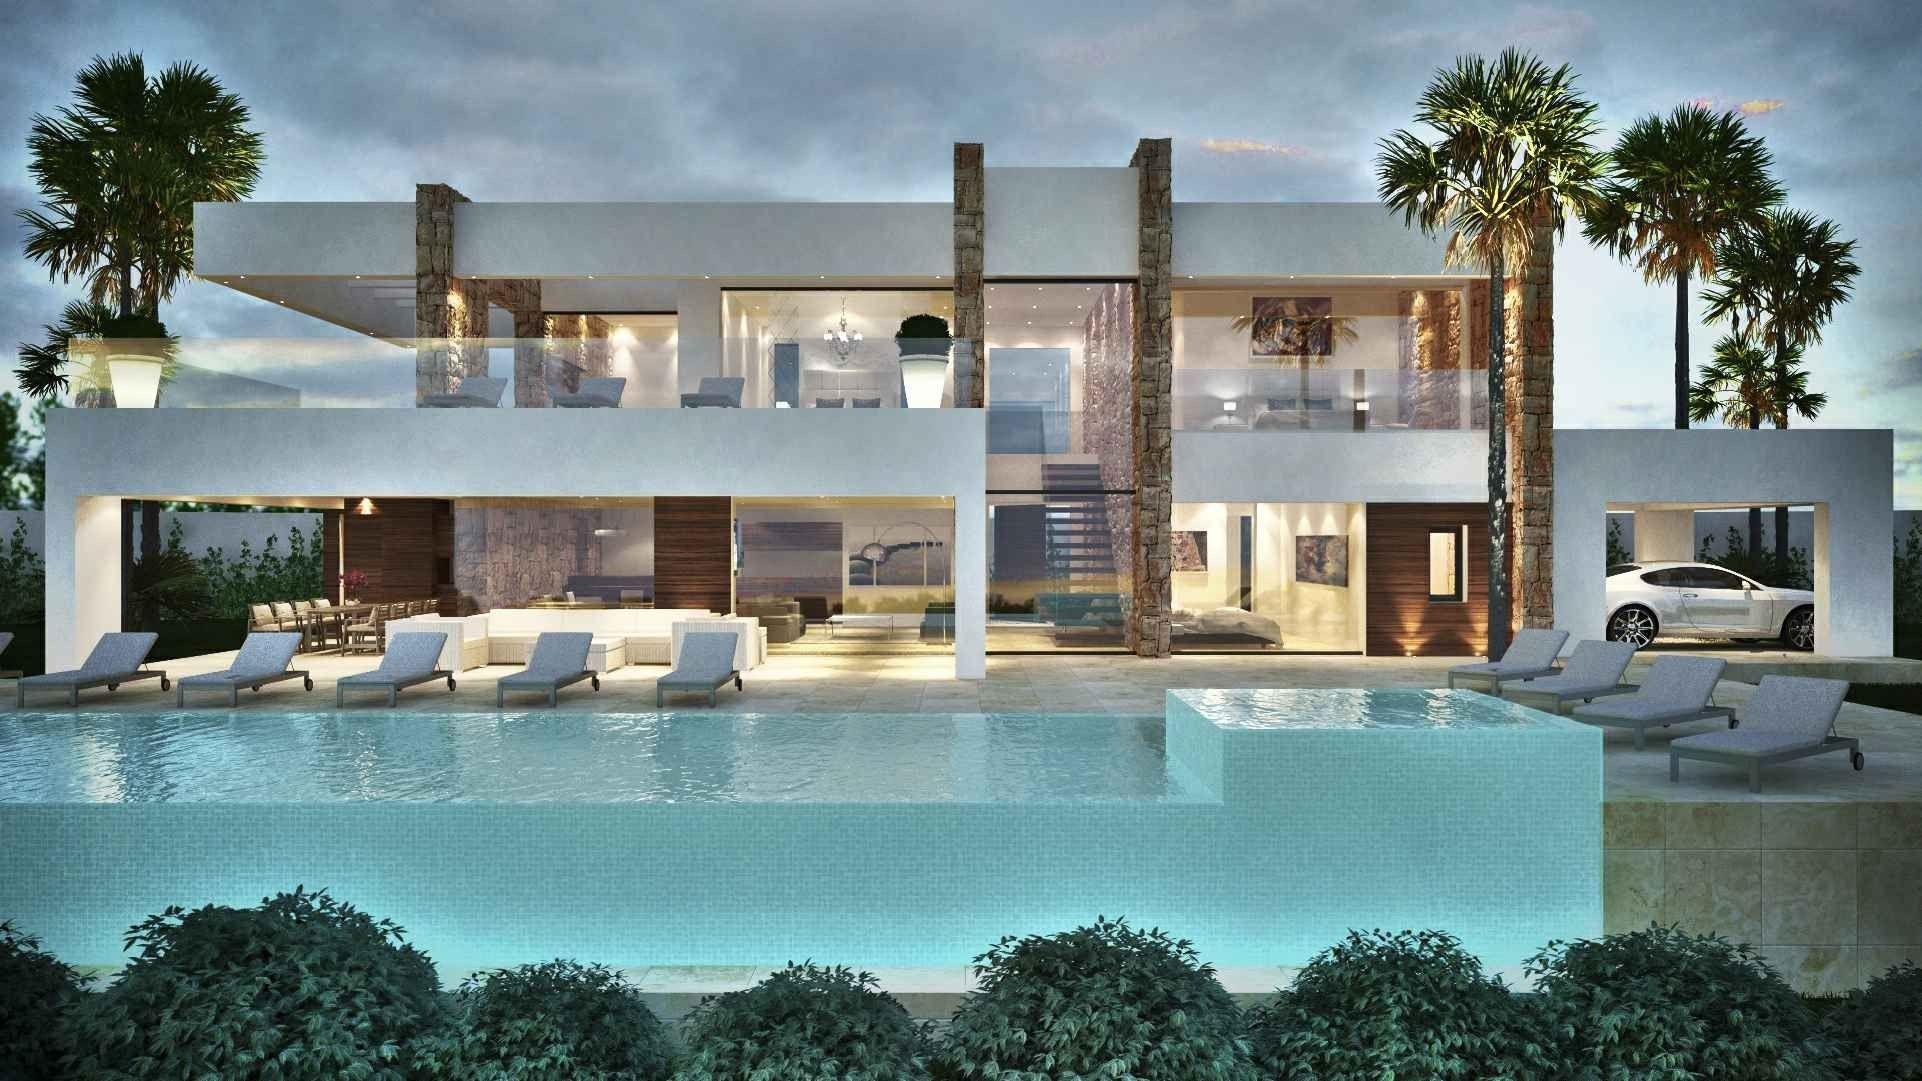 MODERN VILLAS MARBELLA Villas for sale in Marbella  Pools 4  Pinterest  Villas Marbella